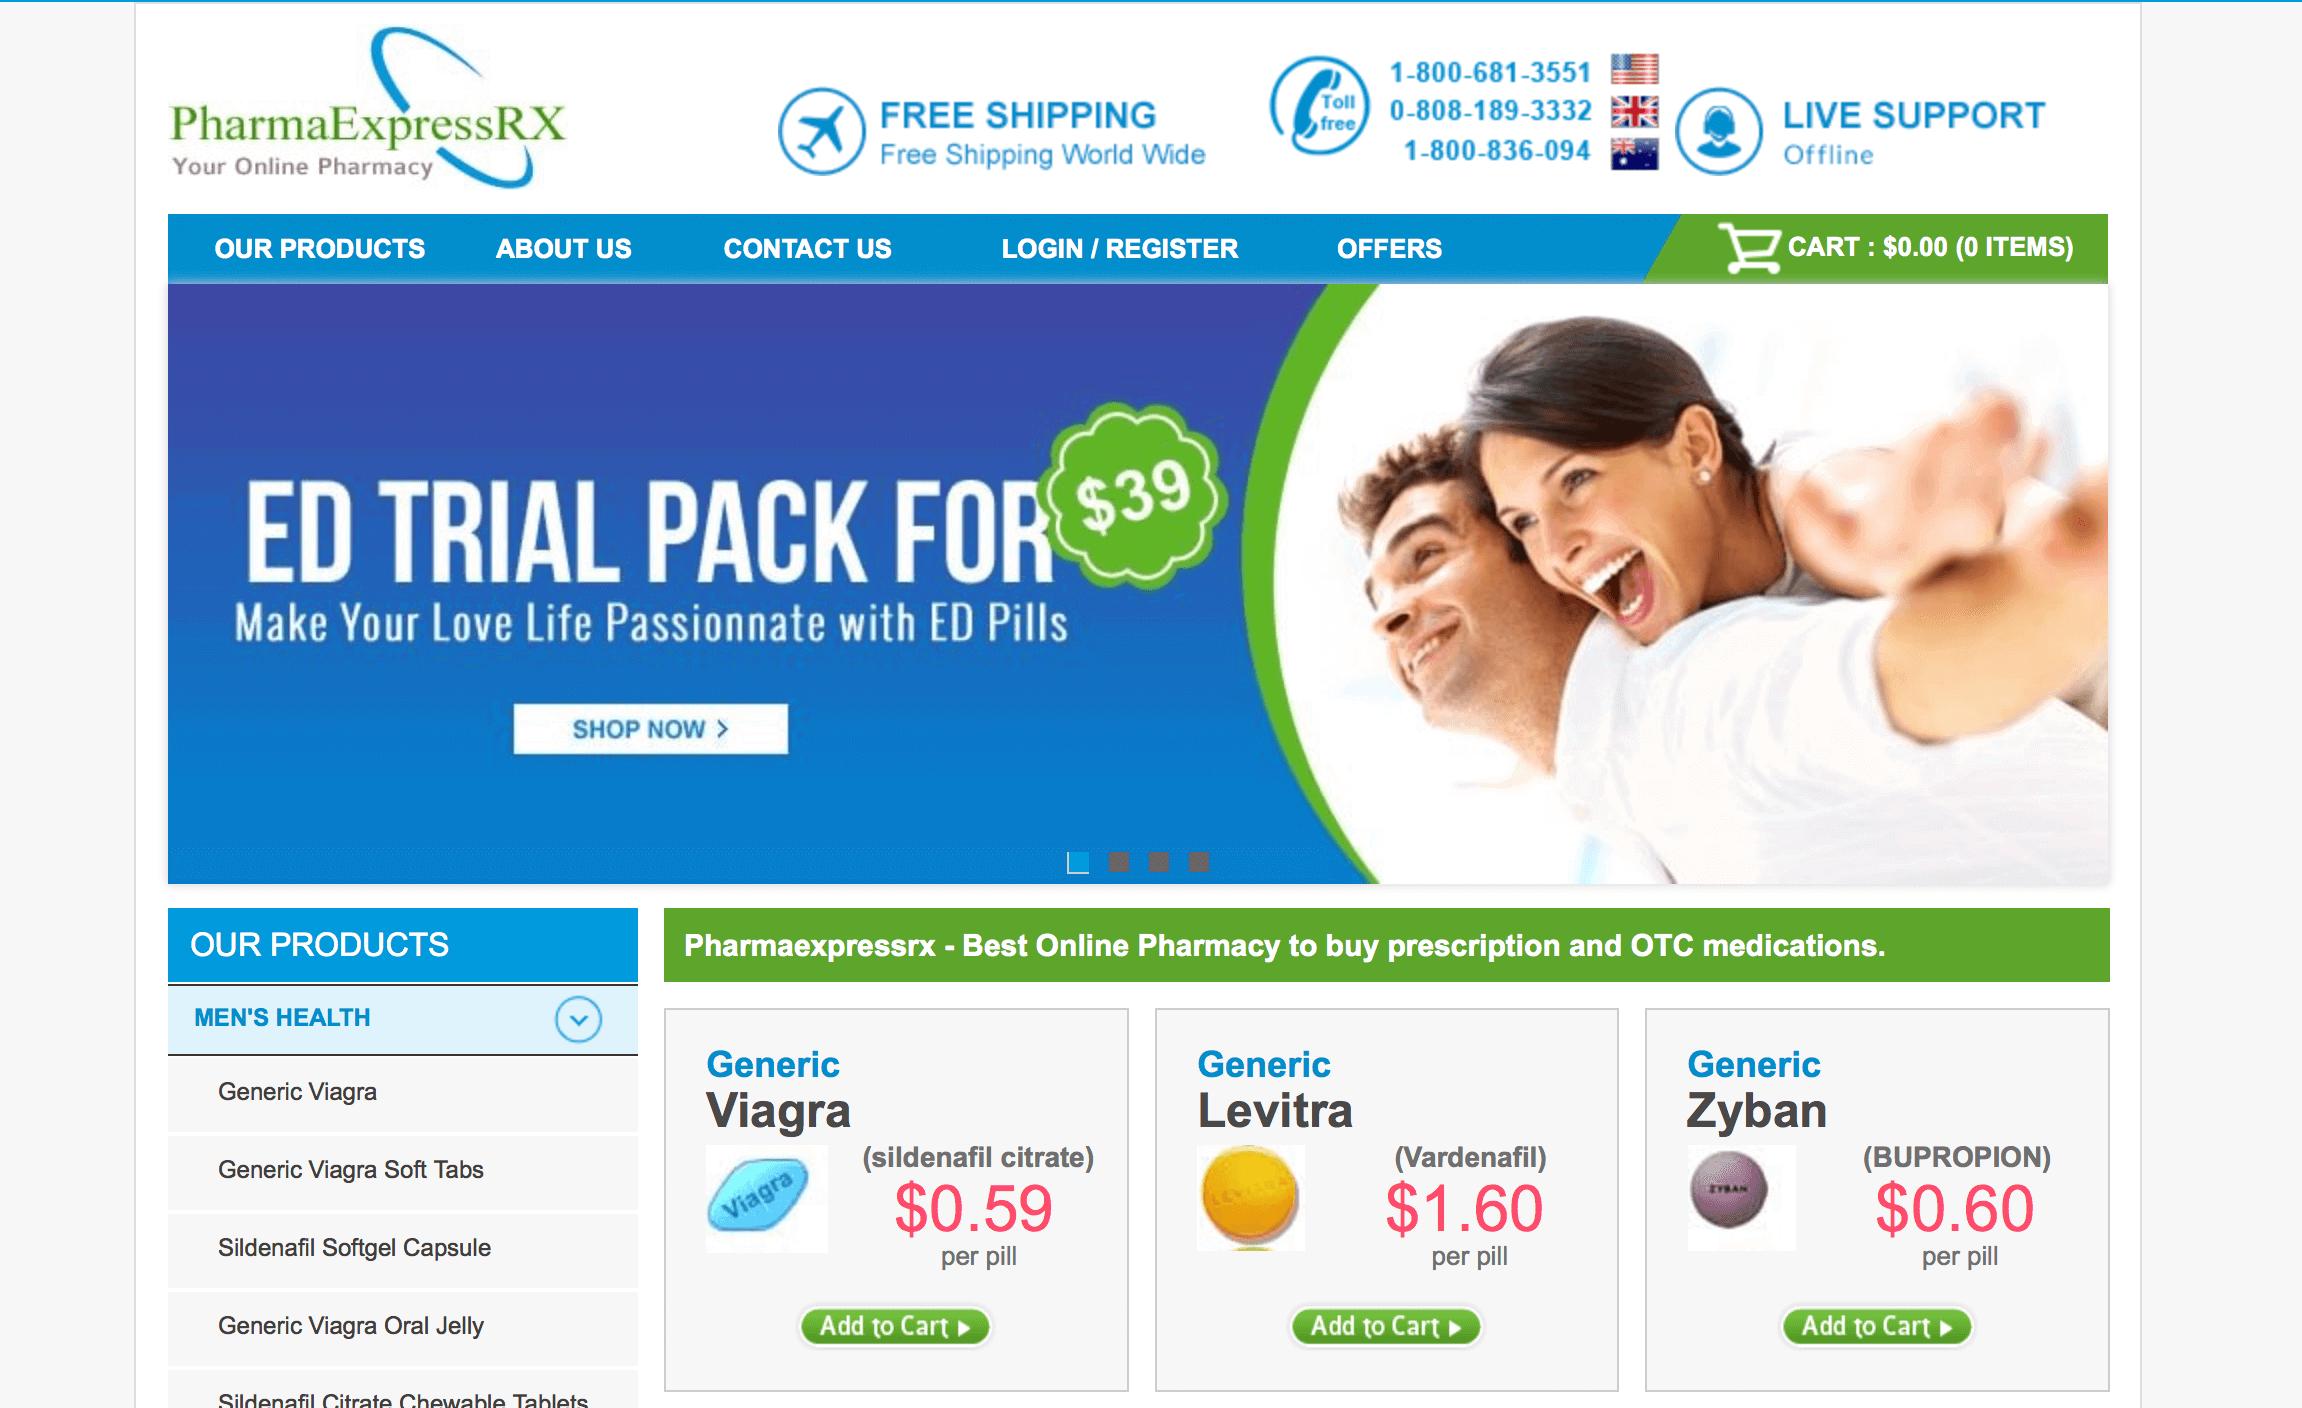 PharmaExpressRX.com Pharmacy Review